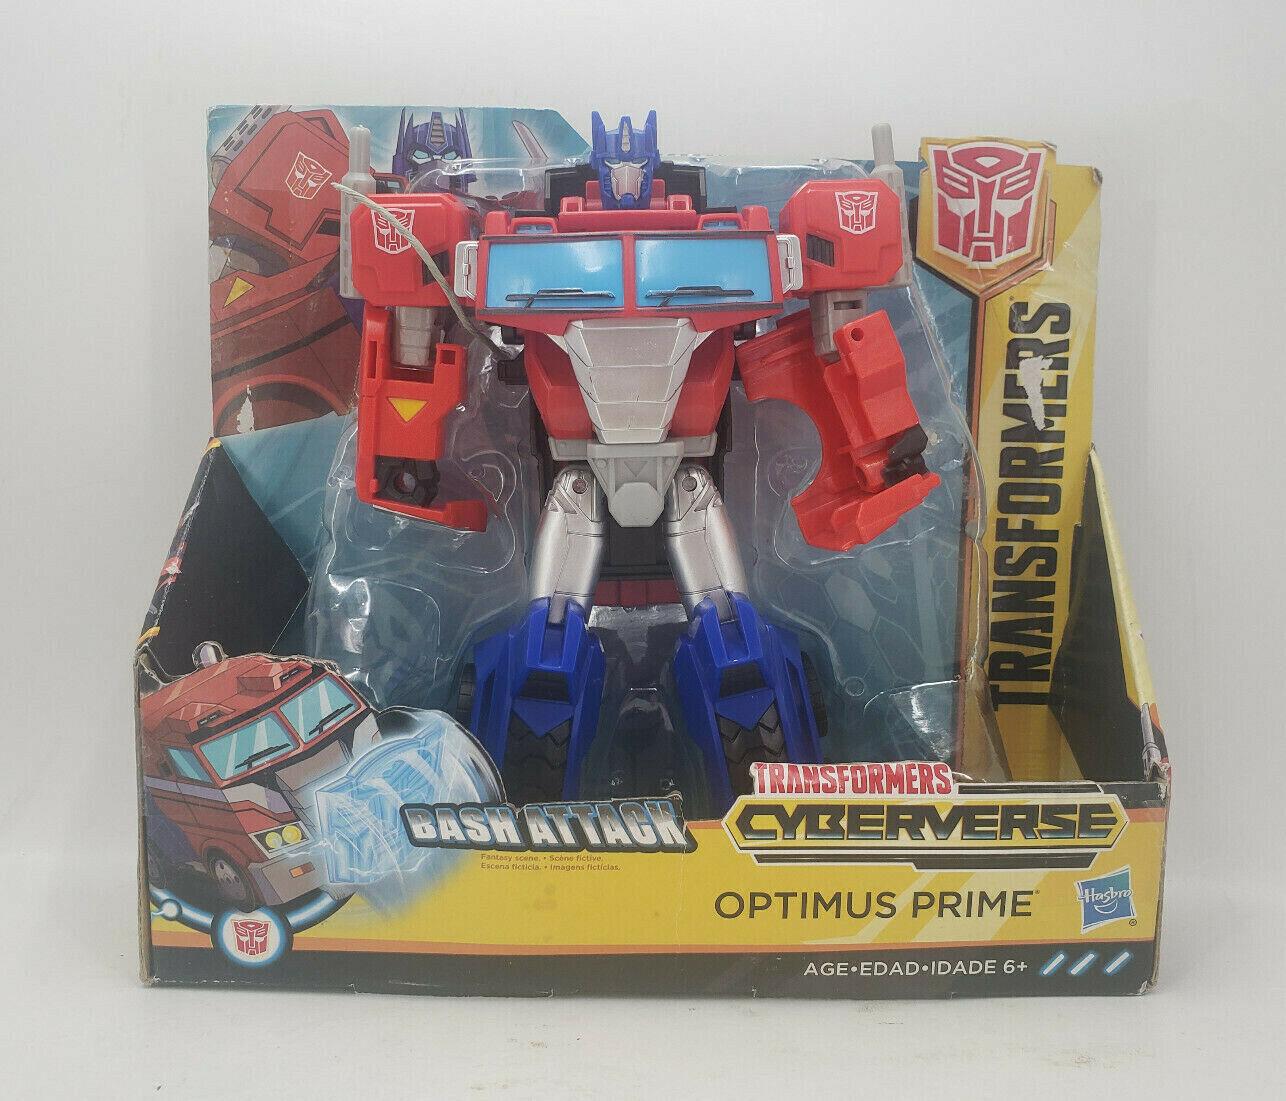 Bumblebee Cyberverse Adventures Hasbro Transformers: Optimus Prime for sale online E7112